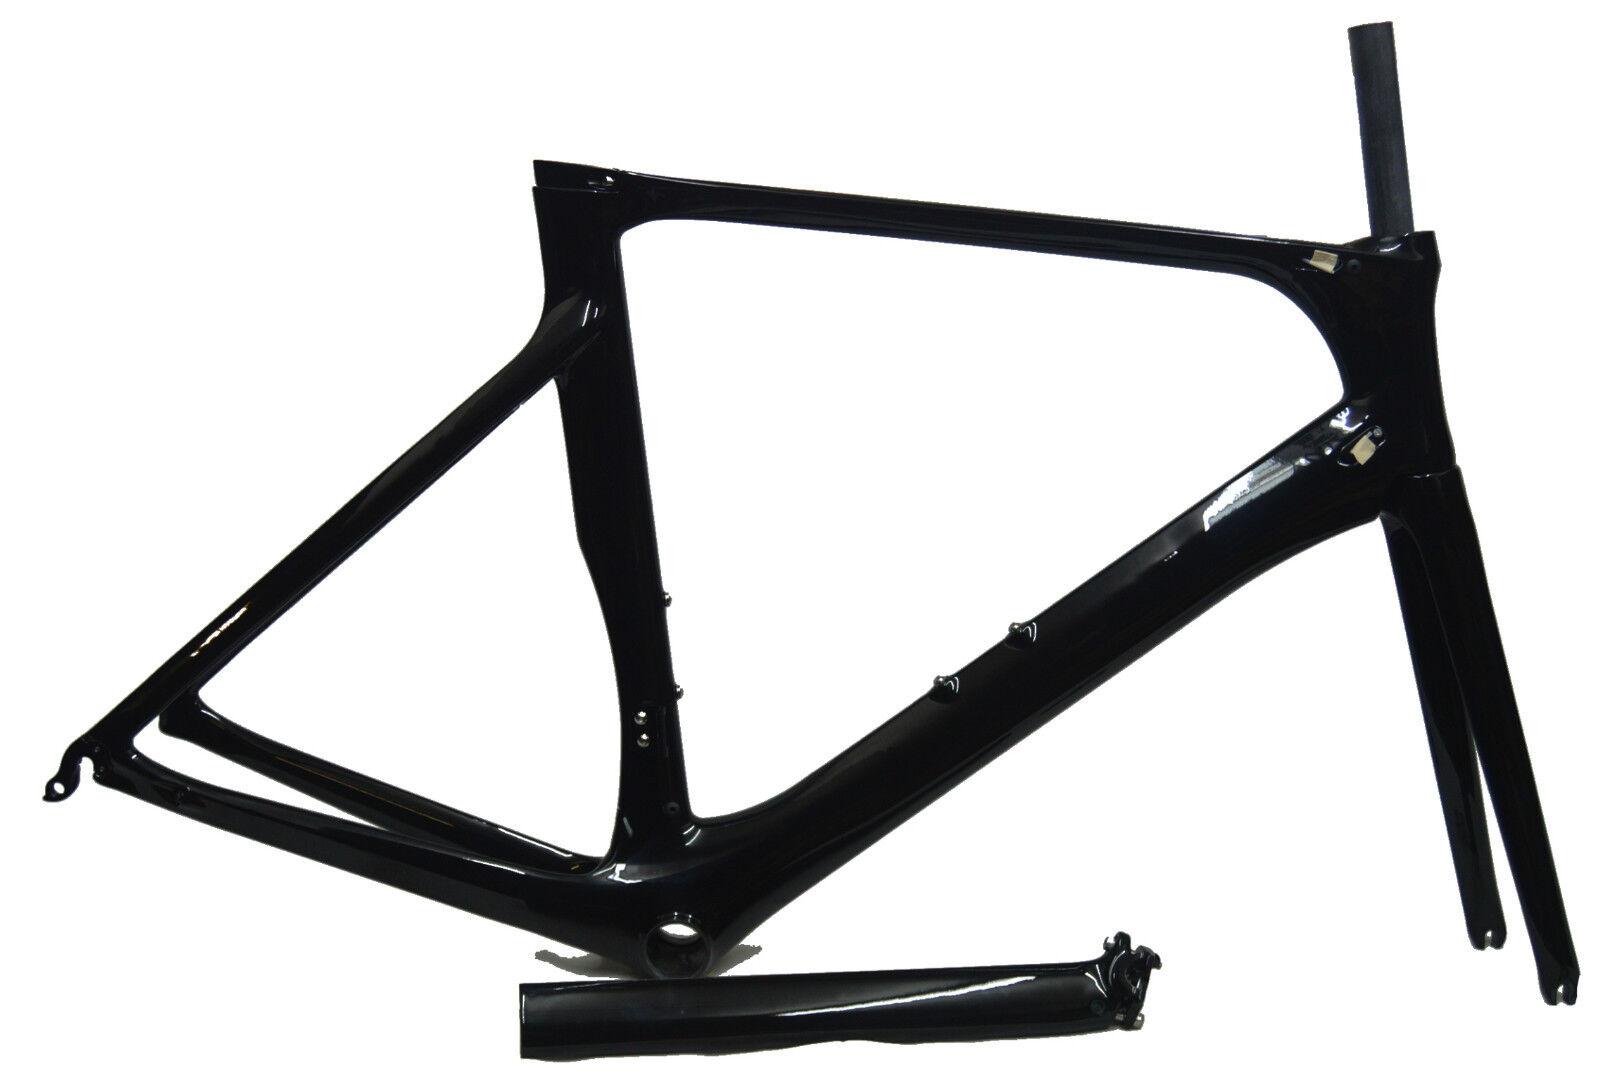 2 Gru pieno TELAIO IN CARBONIO Set 700c AERO road bike frame BB86 UD LUCIDO